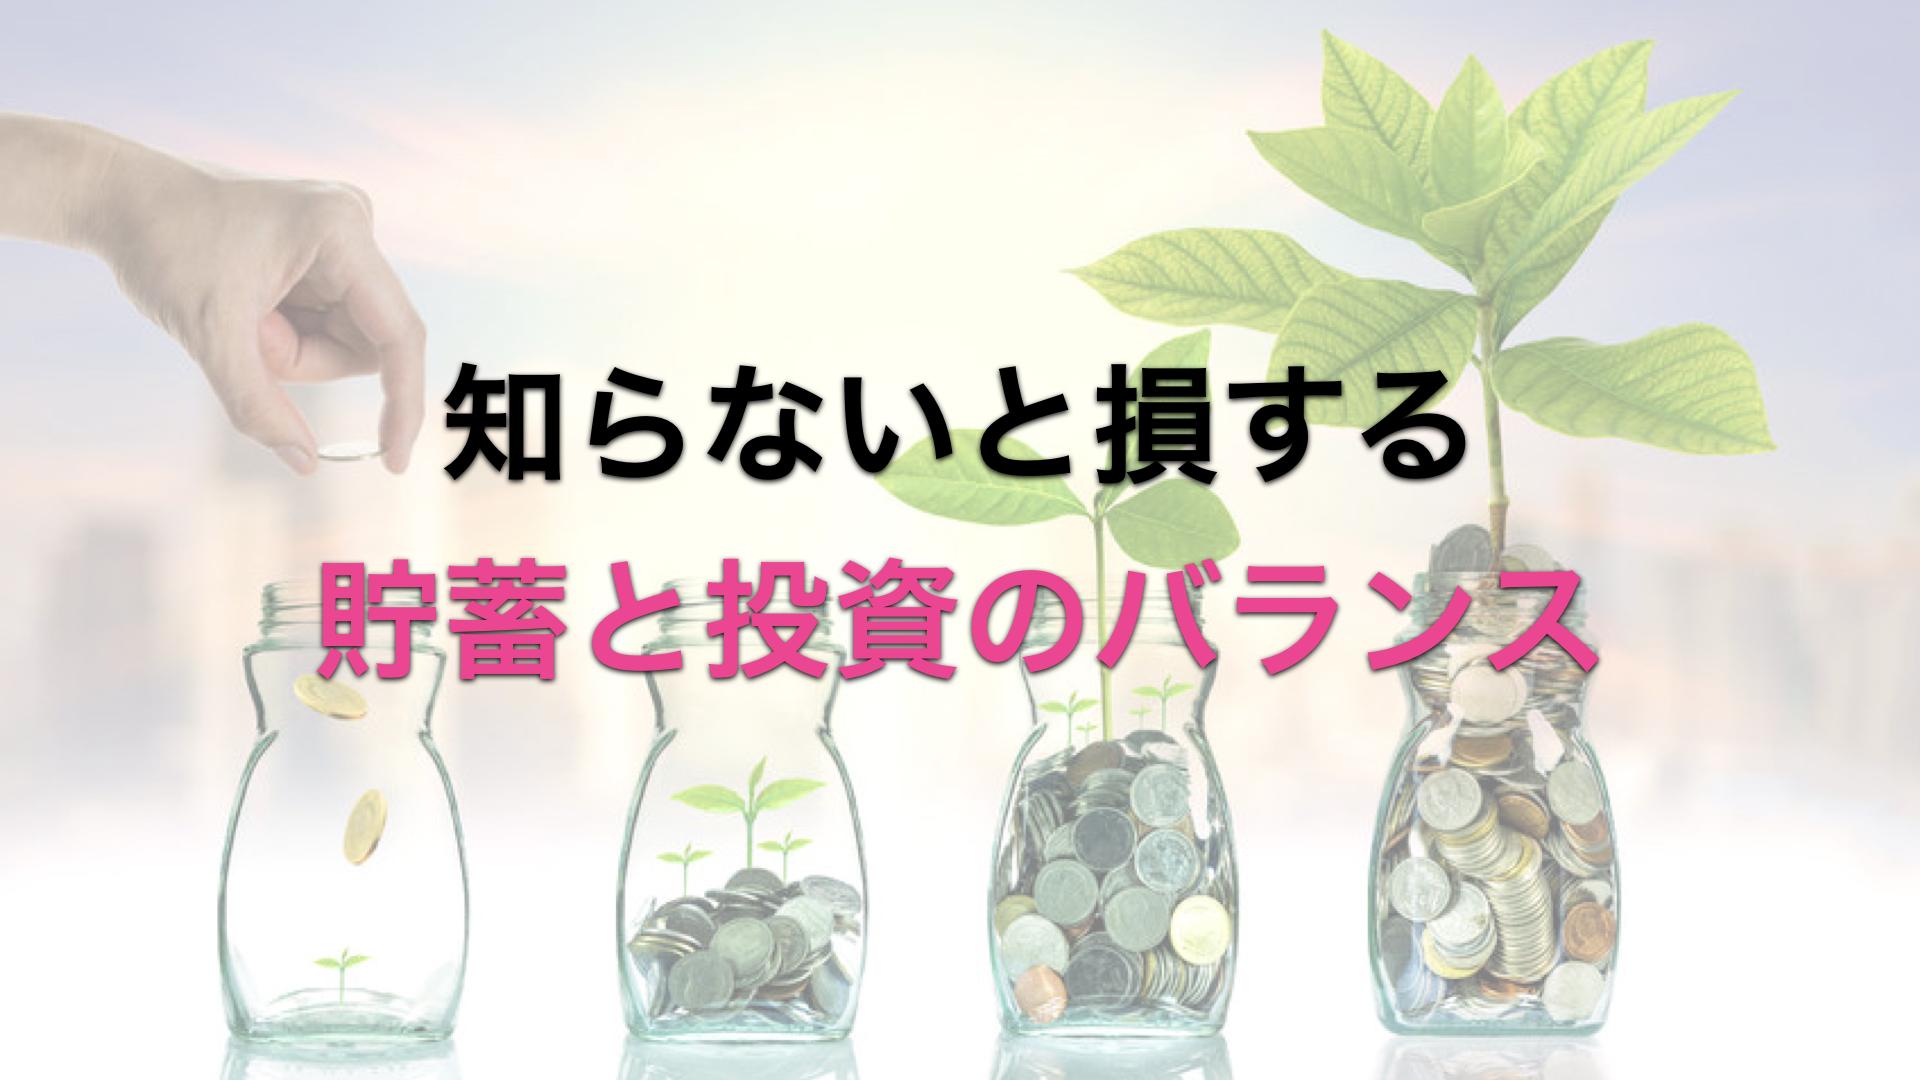 savingsinvetment.001